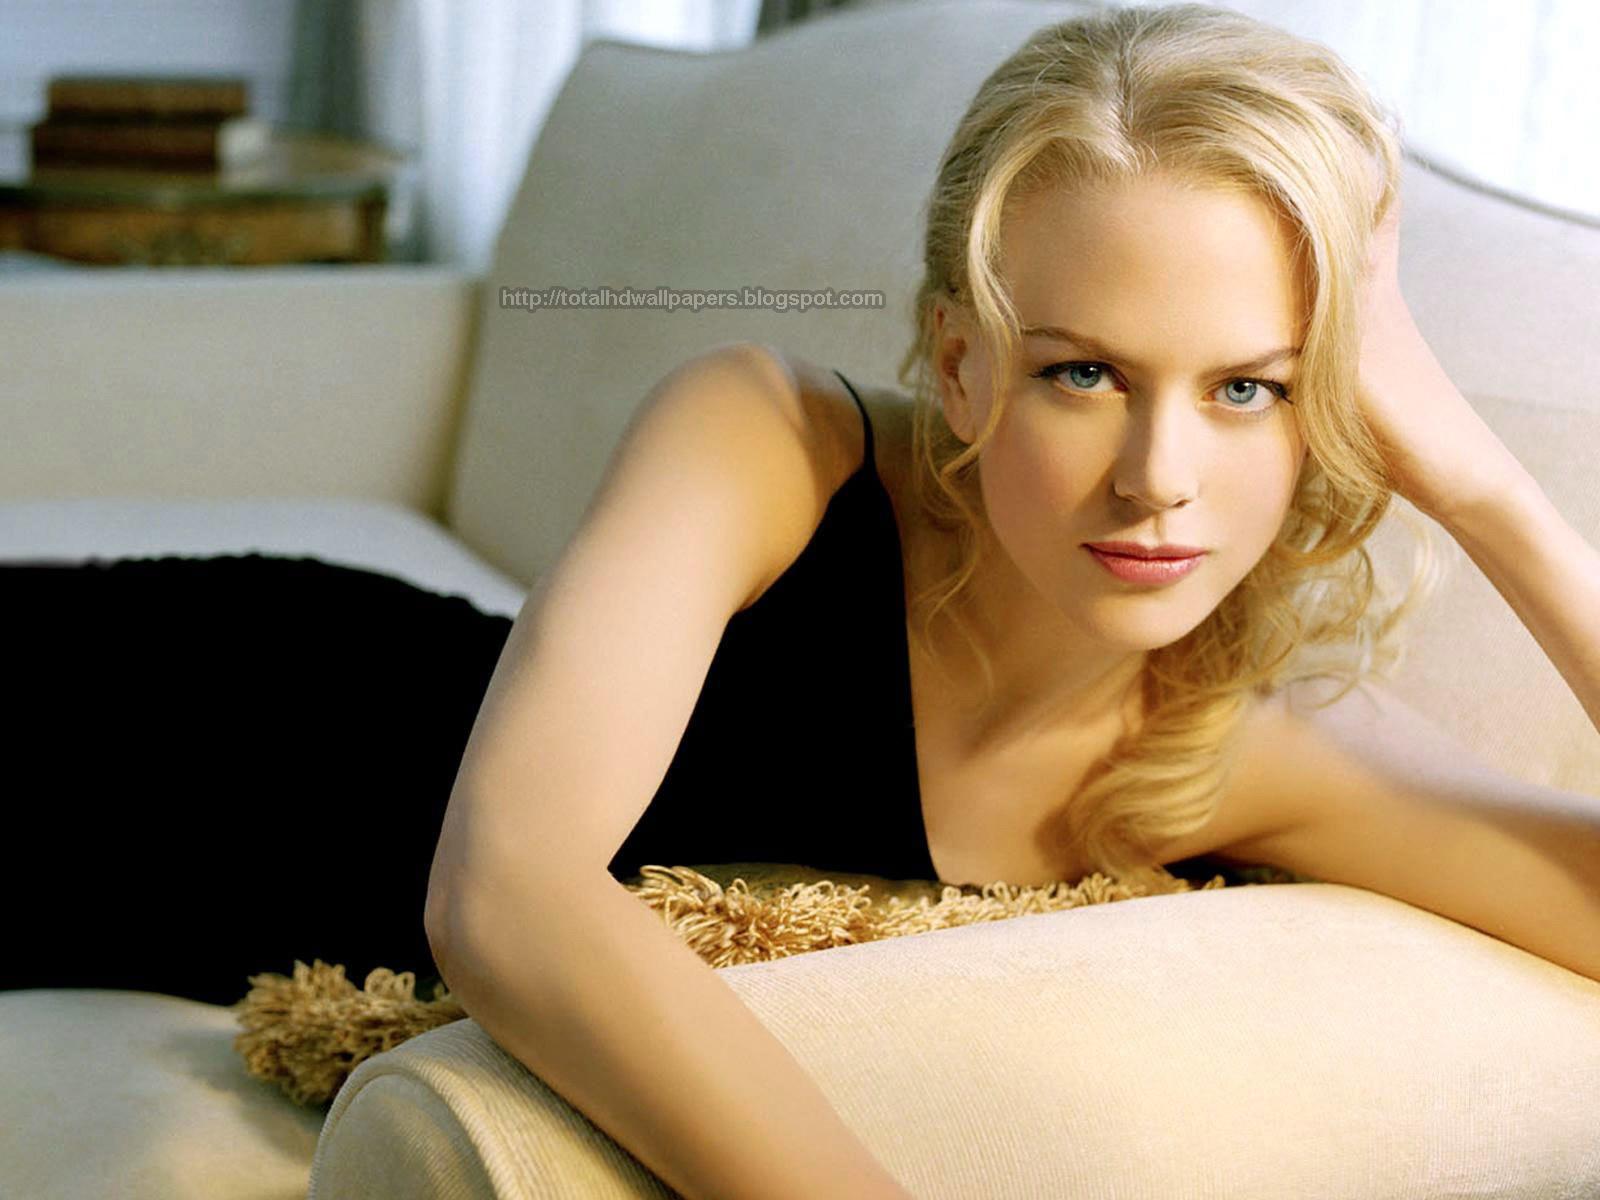 Bollywood Actress High Quality Wallpapers Nicole Kidman -2146